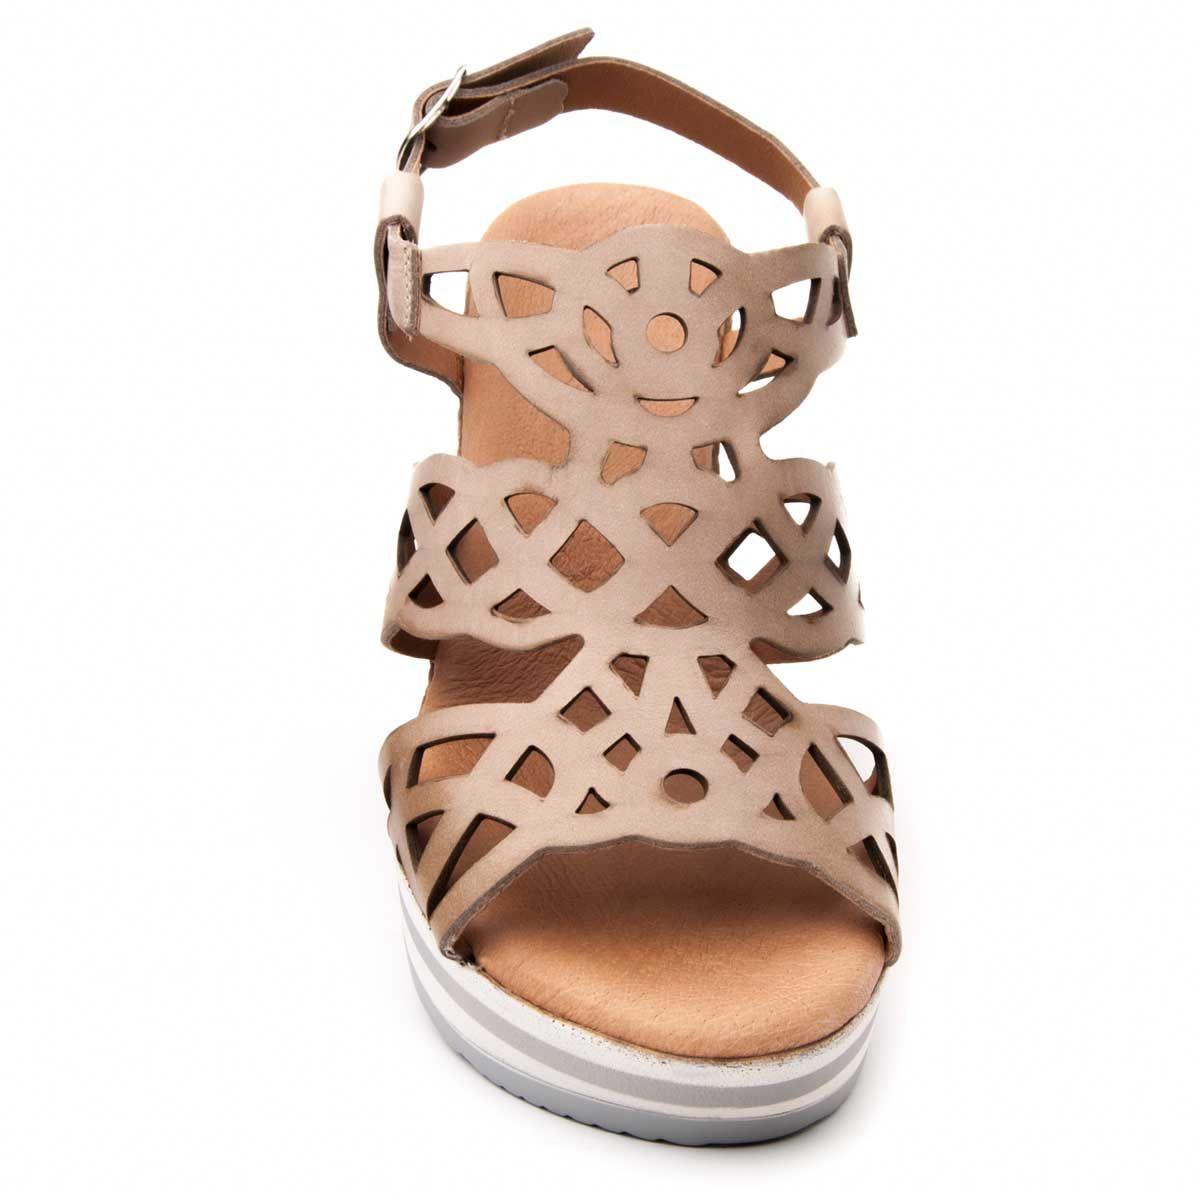 Purapiel Chunky Heel Sandal in Grey